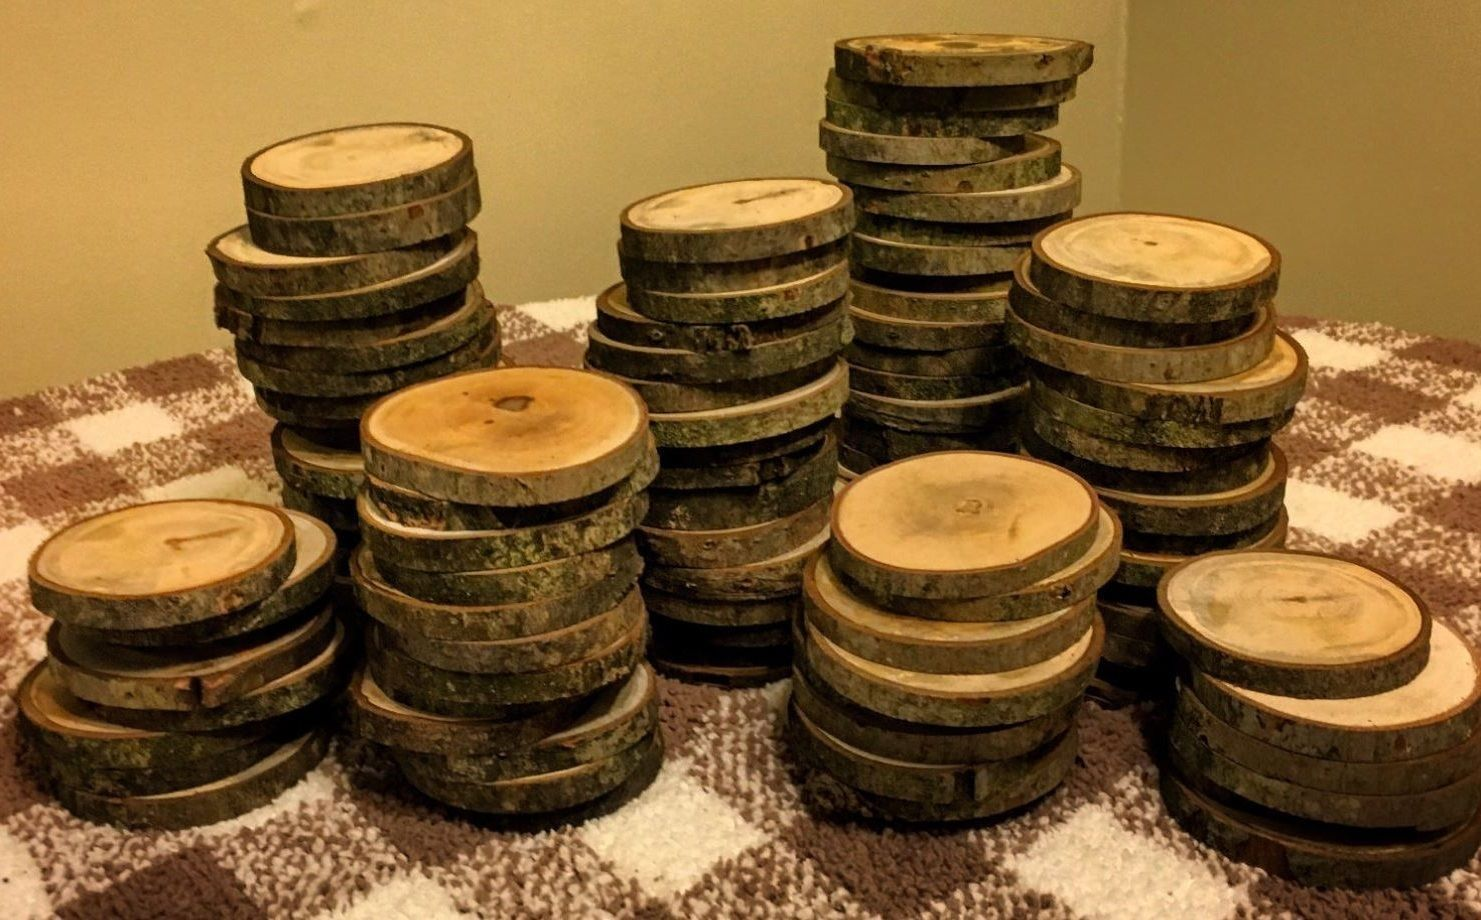 100 Wooden Wood Log Slices Discs Round Decorative Rustic Wedding Decorations